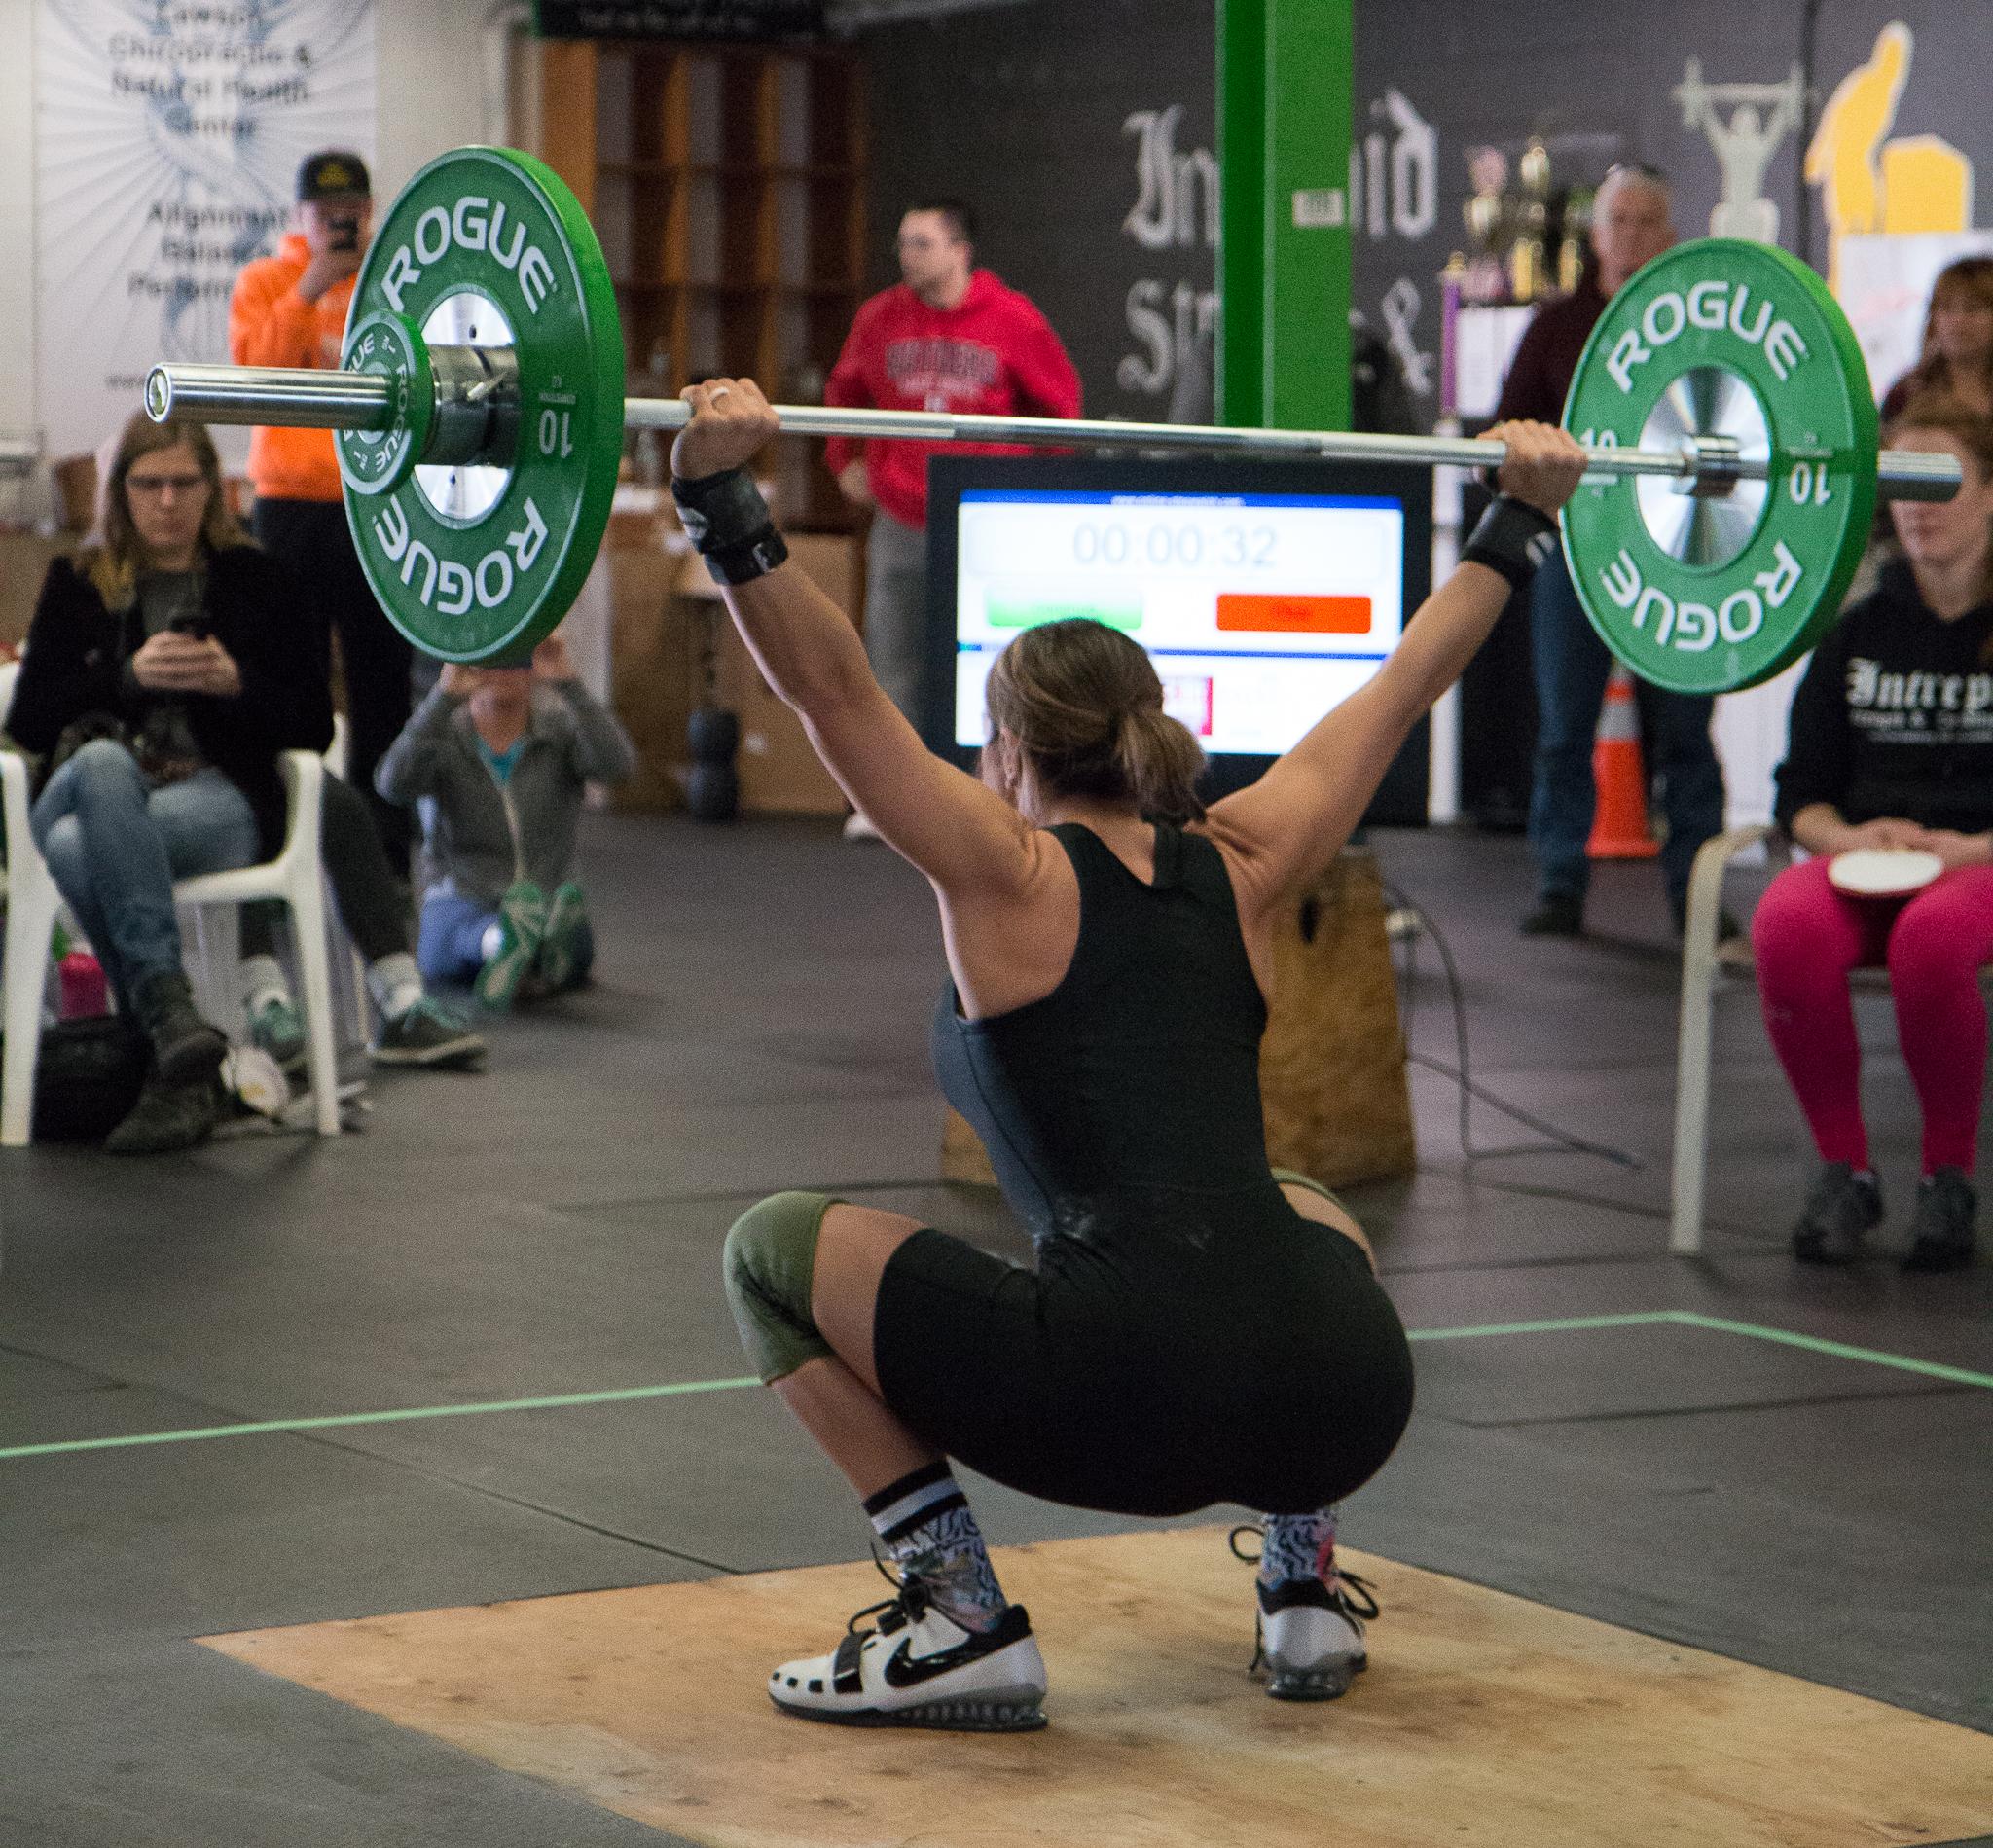 4-men-warwick-new-york-intrepid-strength-conditioning-winter-open-weightlifting-meet-weightlifting-photography (3 of 7).jpg